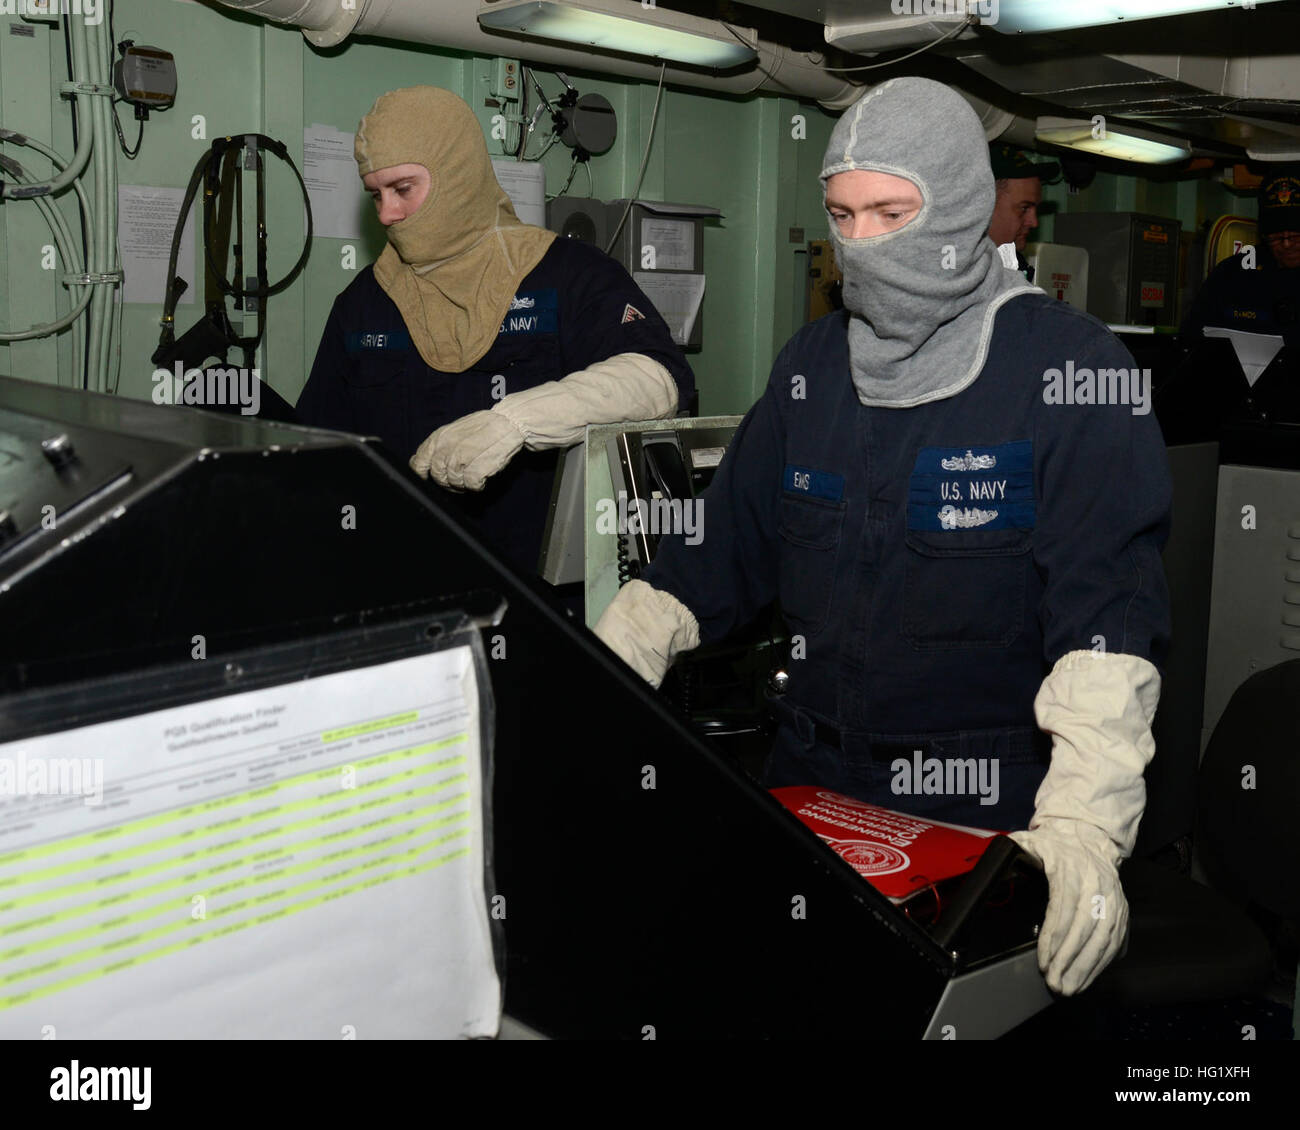 u s navy engineman 2nd class michael harvey left and